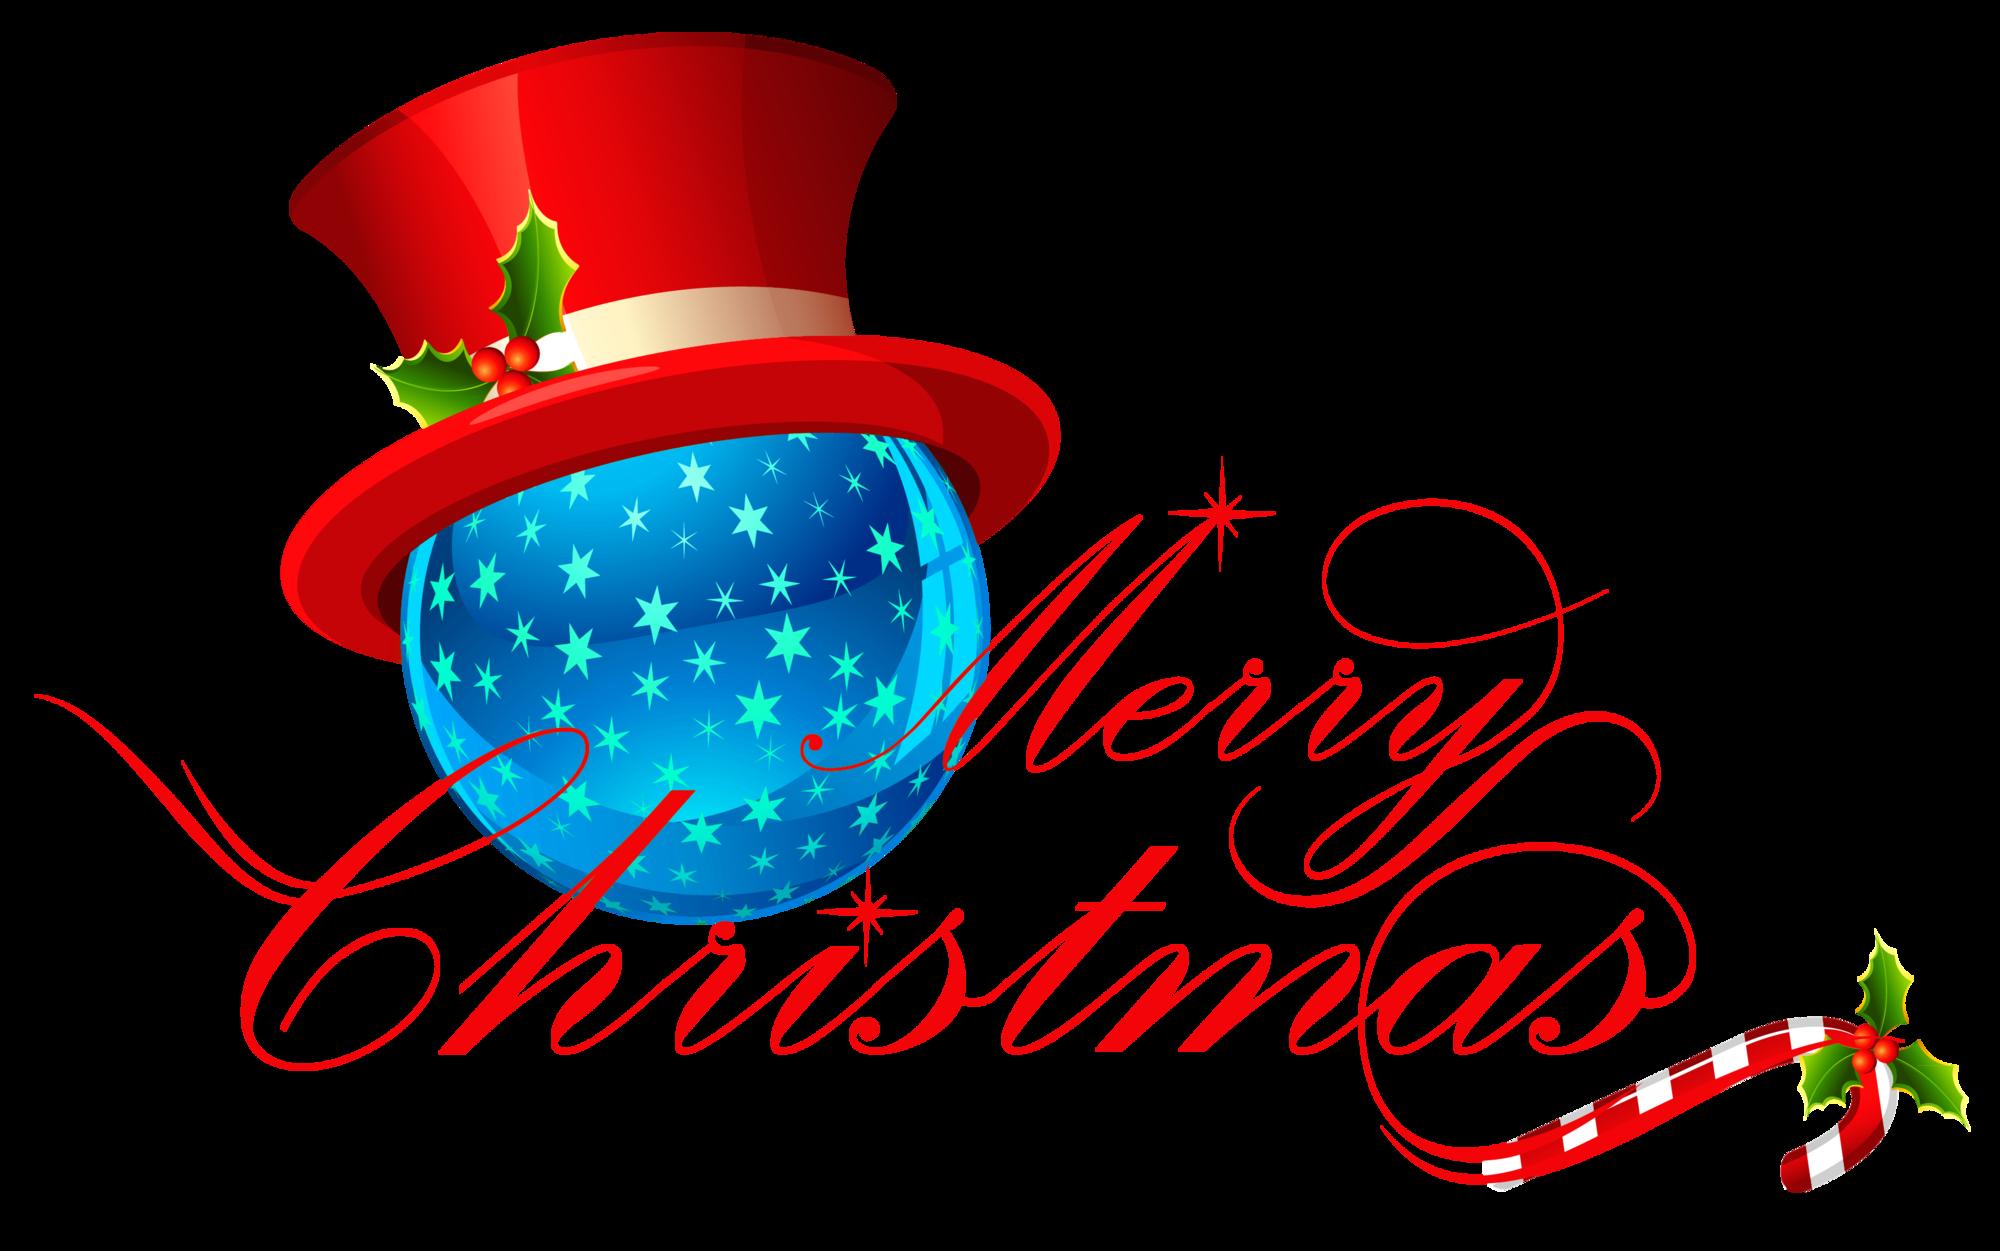 Paw patrol merry christmas clipart clip art transparent Image - Transparent Merry Christmas with Blue Ornament Clipart.png ... clip art transparent